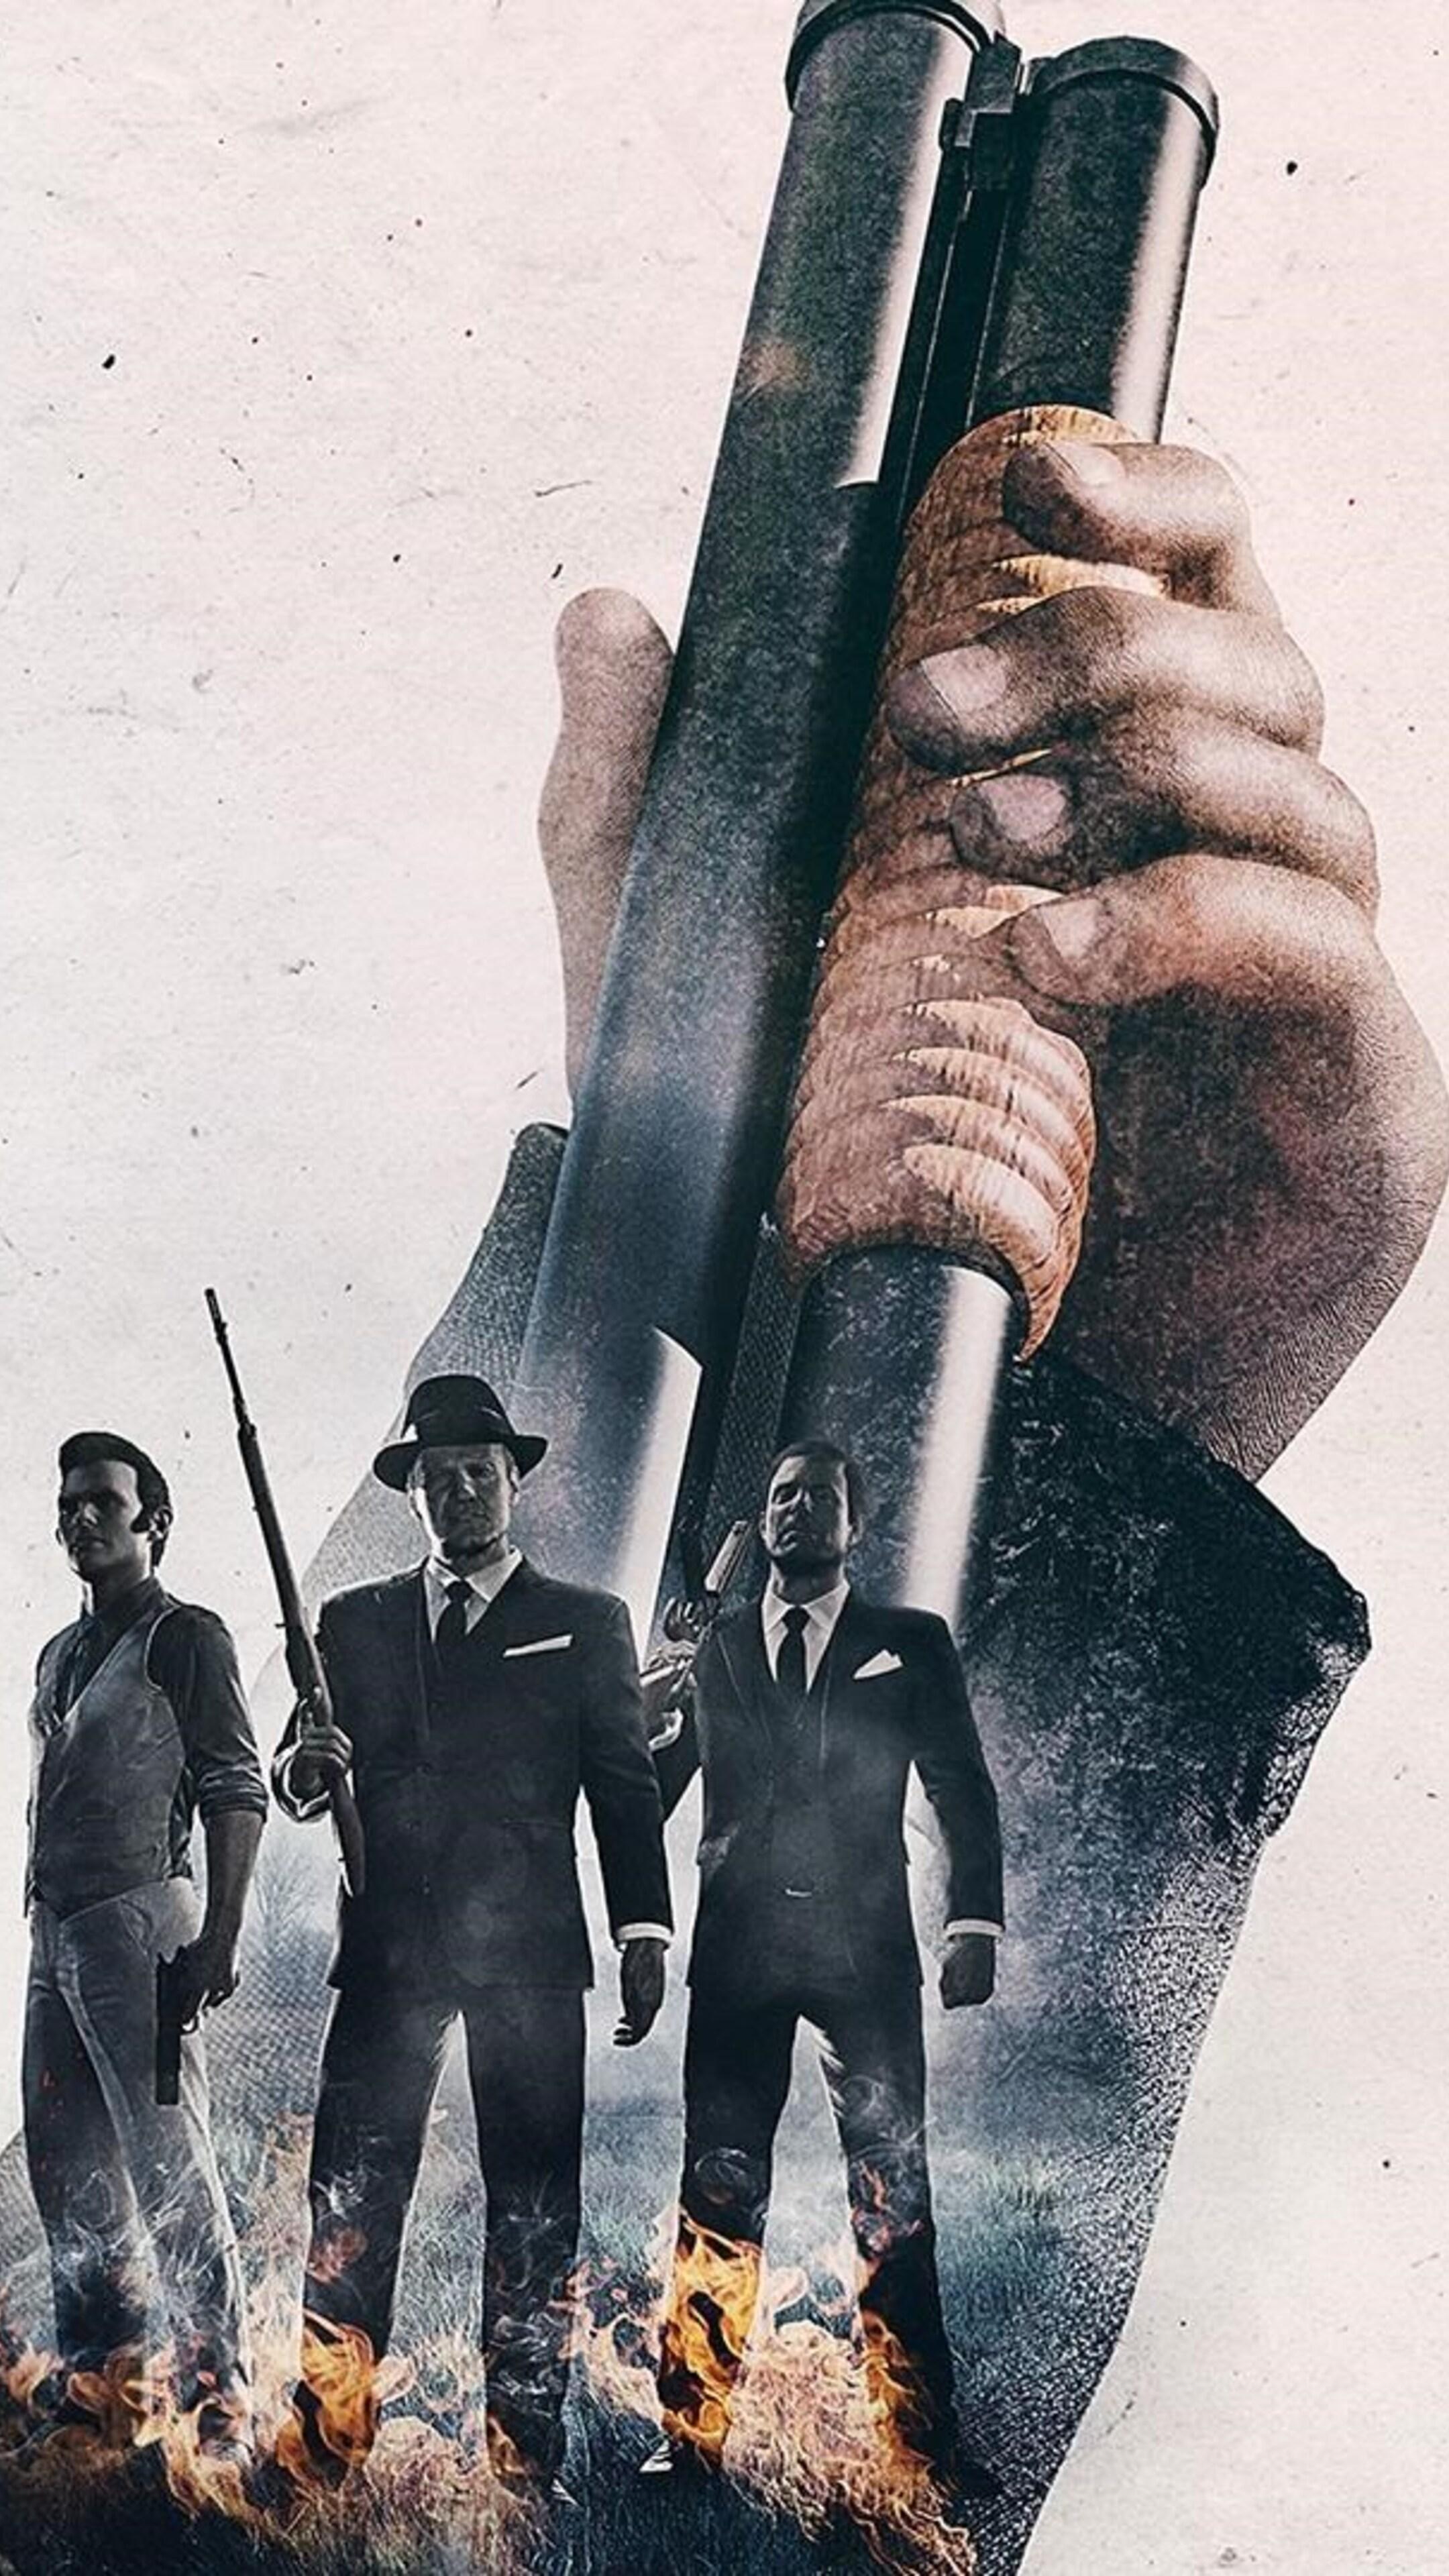 mafia-3-pc-game-4k.jpg